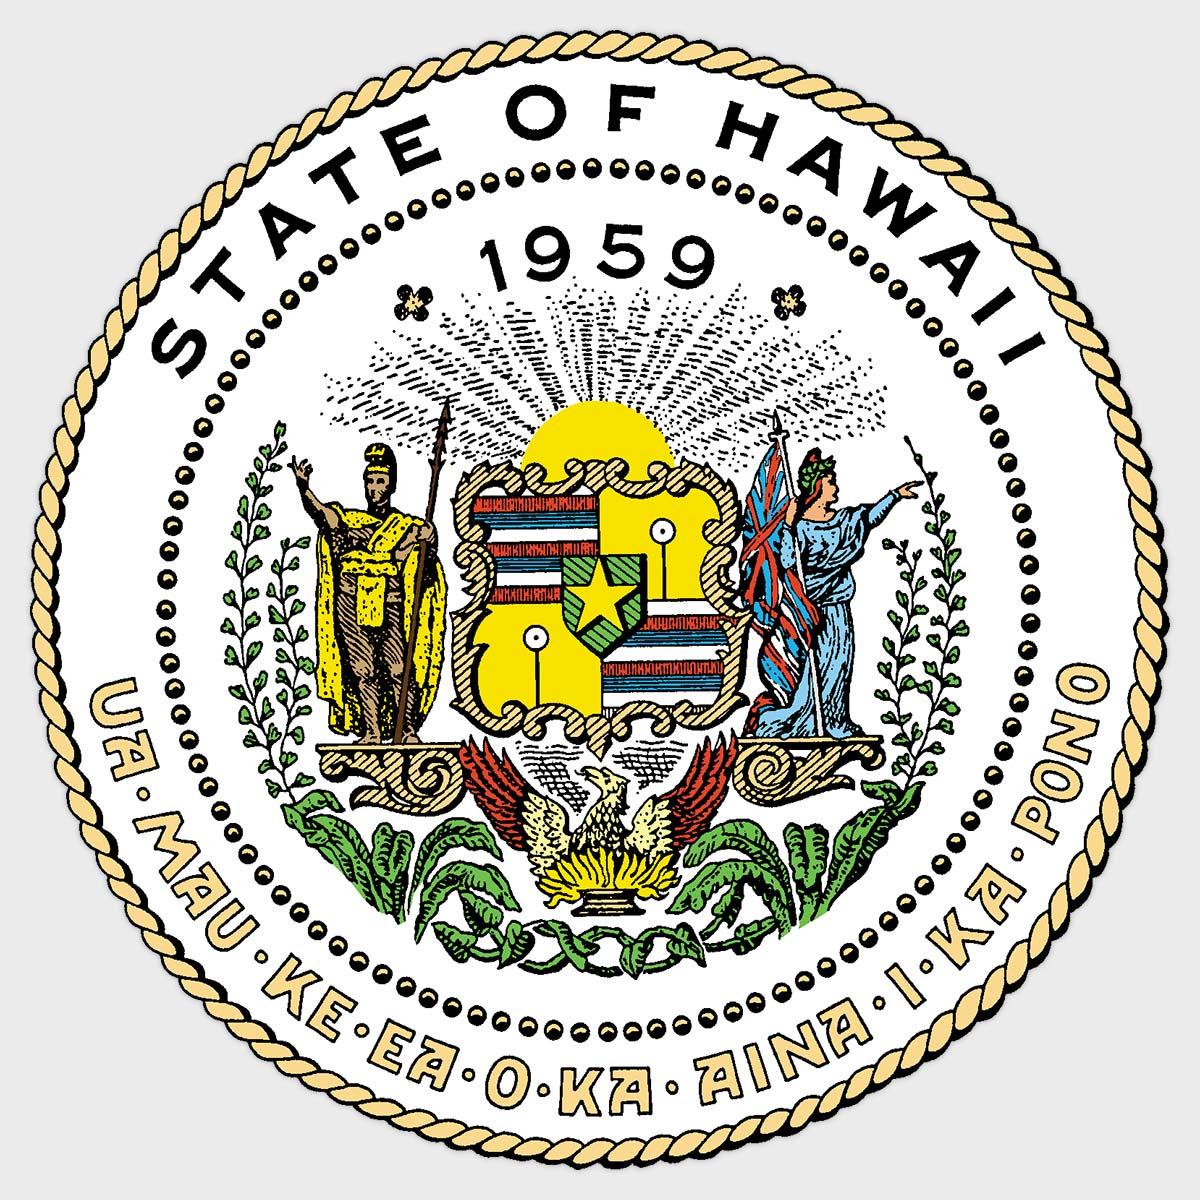 Hawaii Department of Defense logo